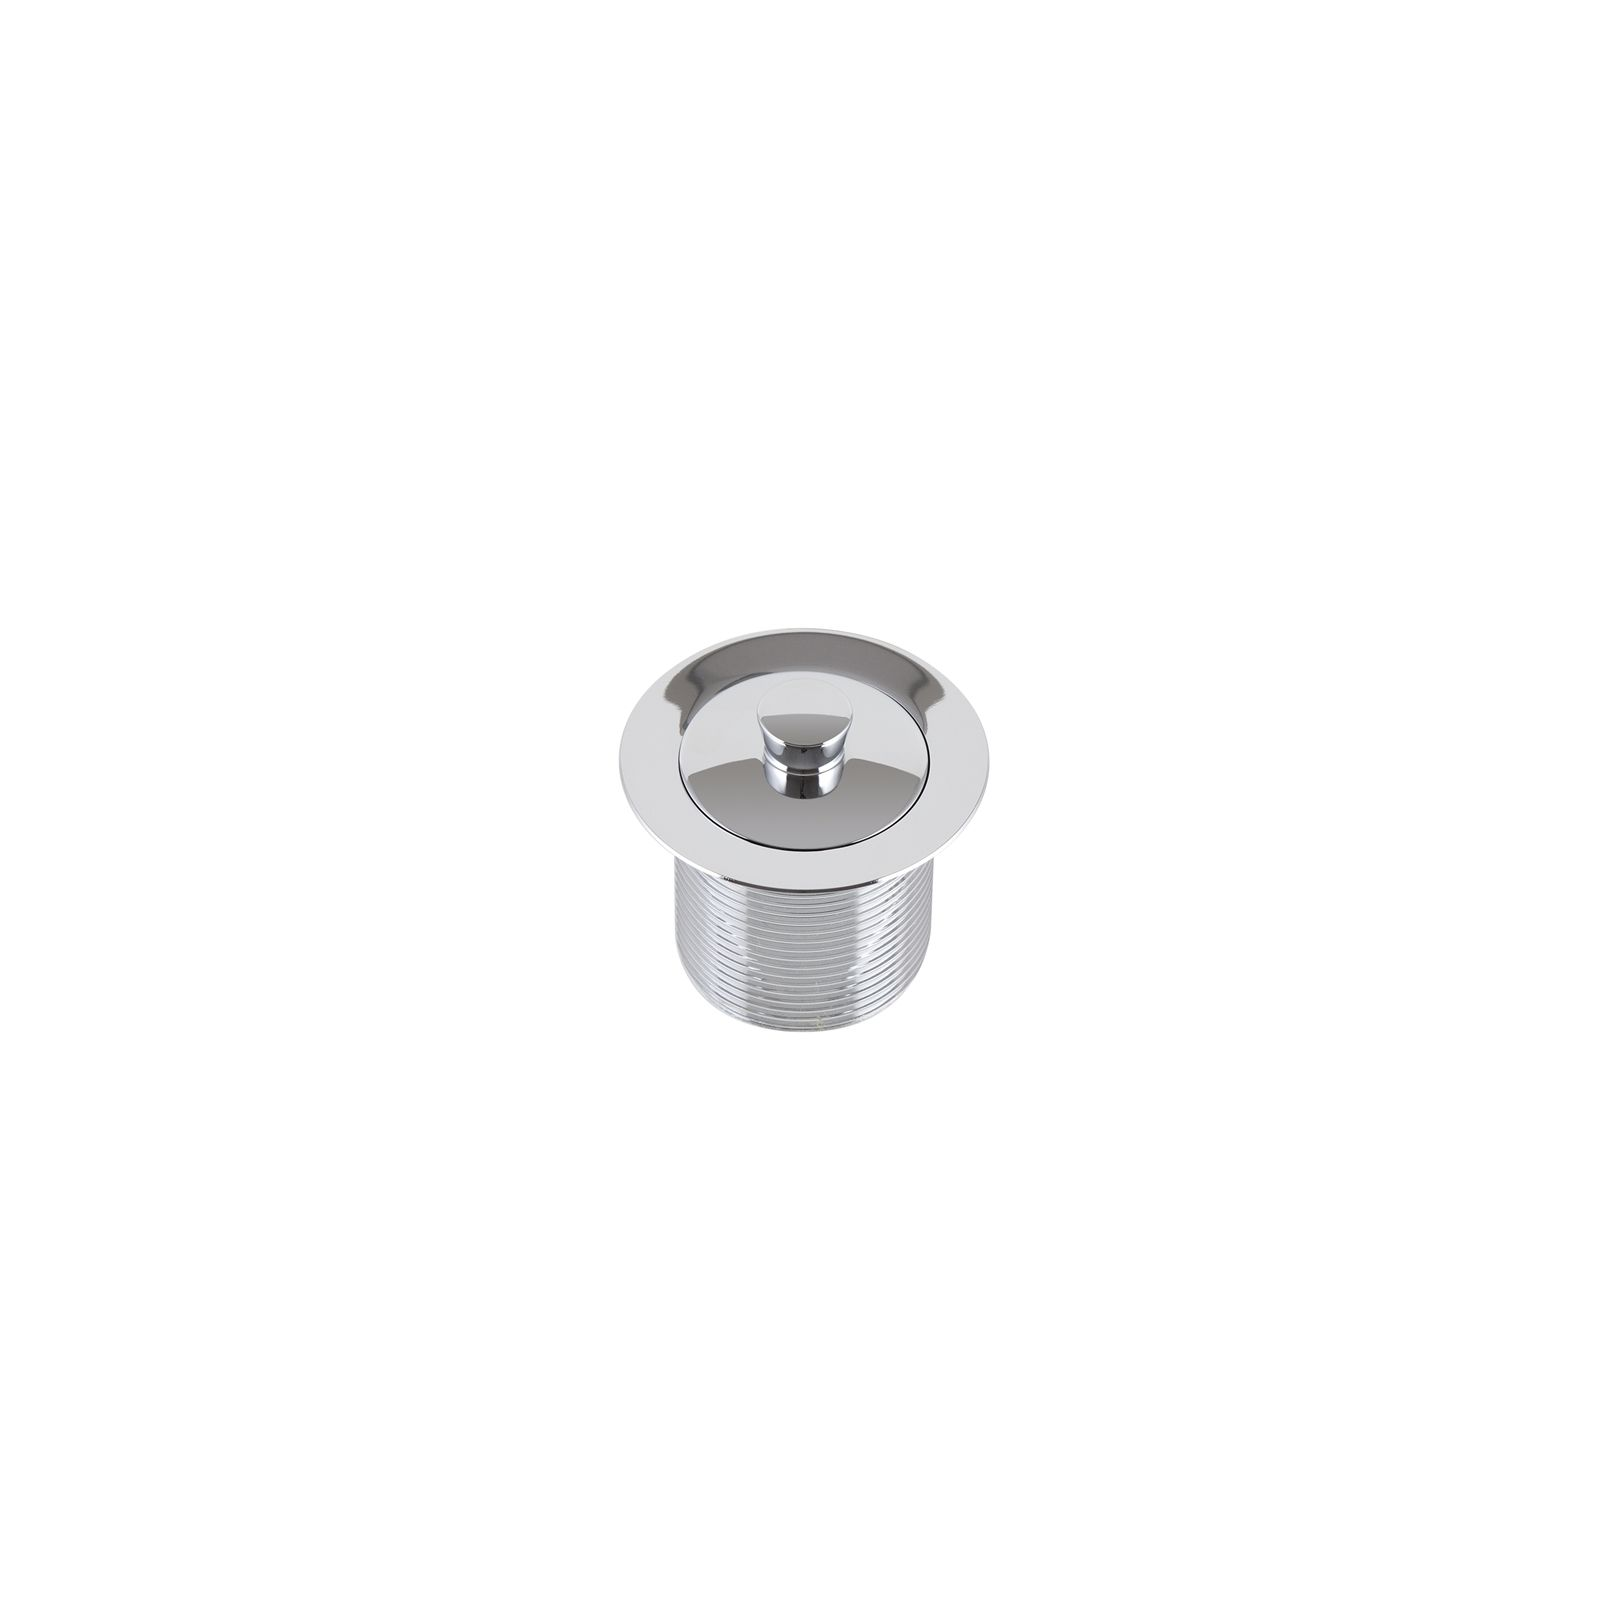 Kinetic 40mm Chrome Bath Waste With Plug Bathroom Toilet